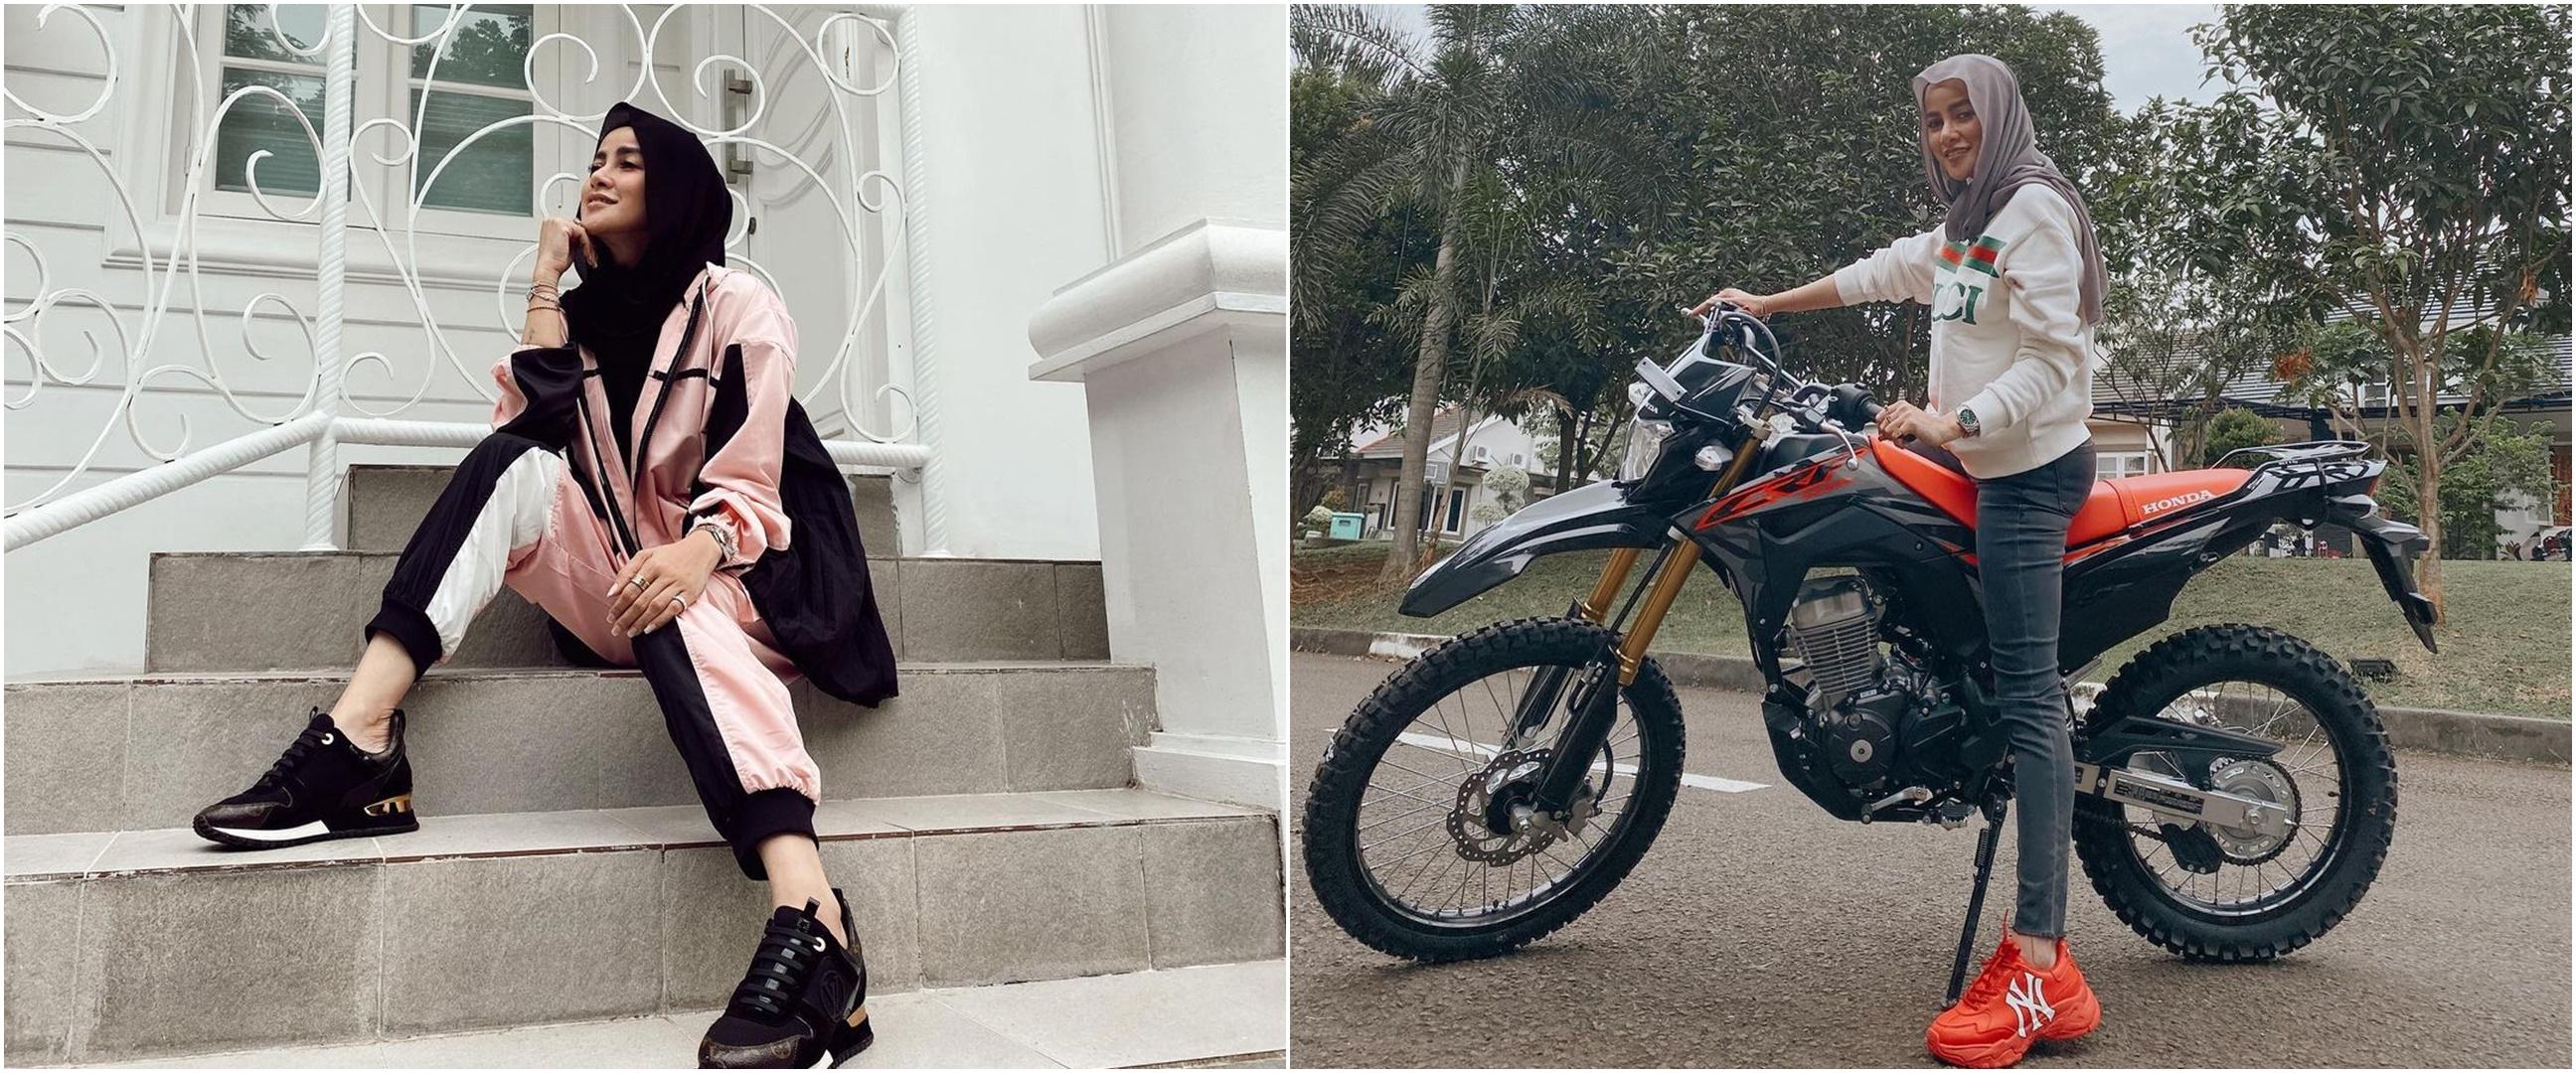 6 Potret Olla Ramlan naik motor, gayanya tetap stylish dan cantik